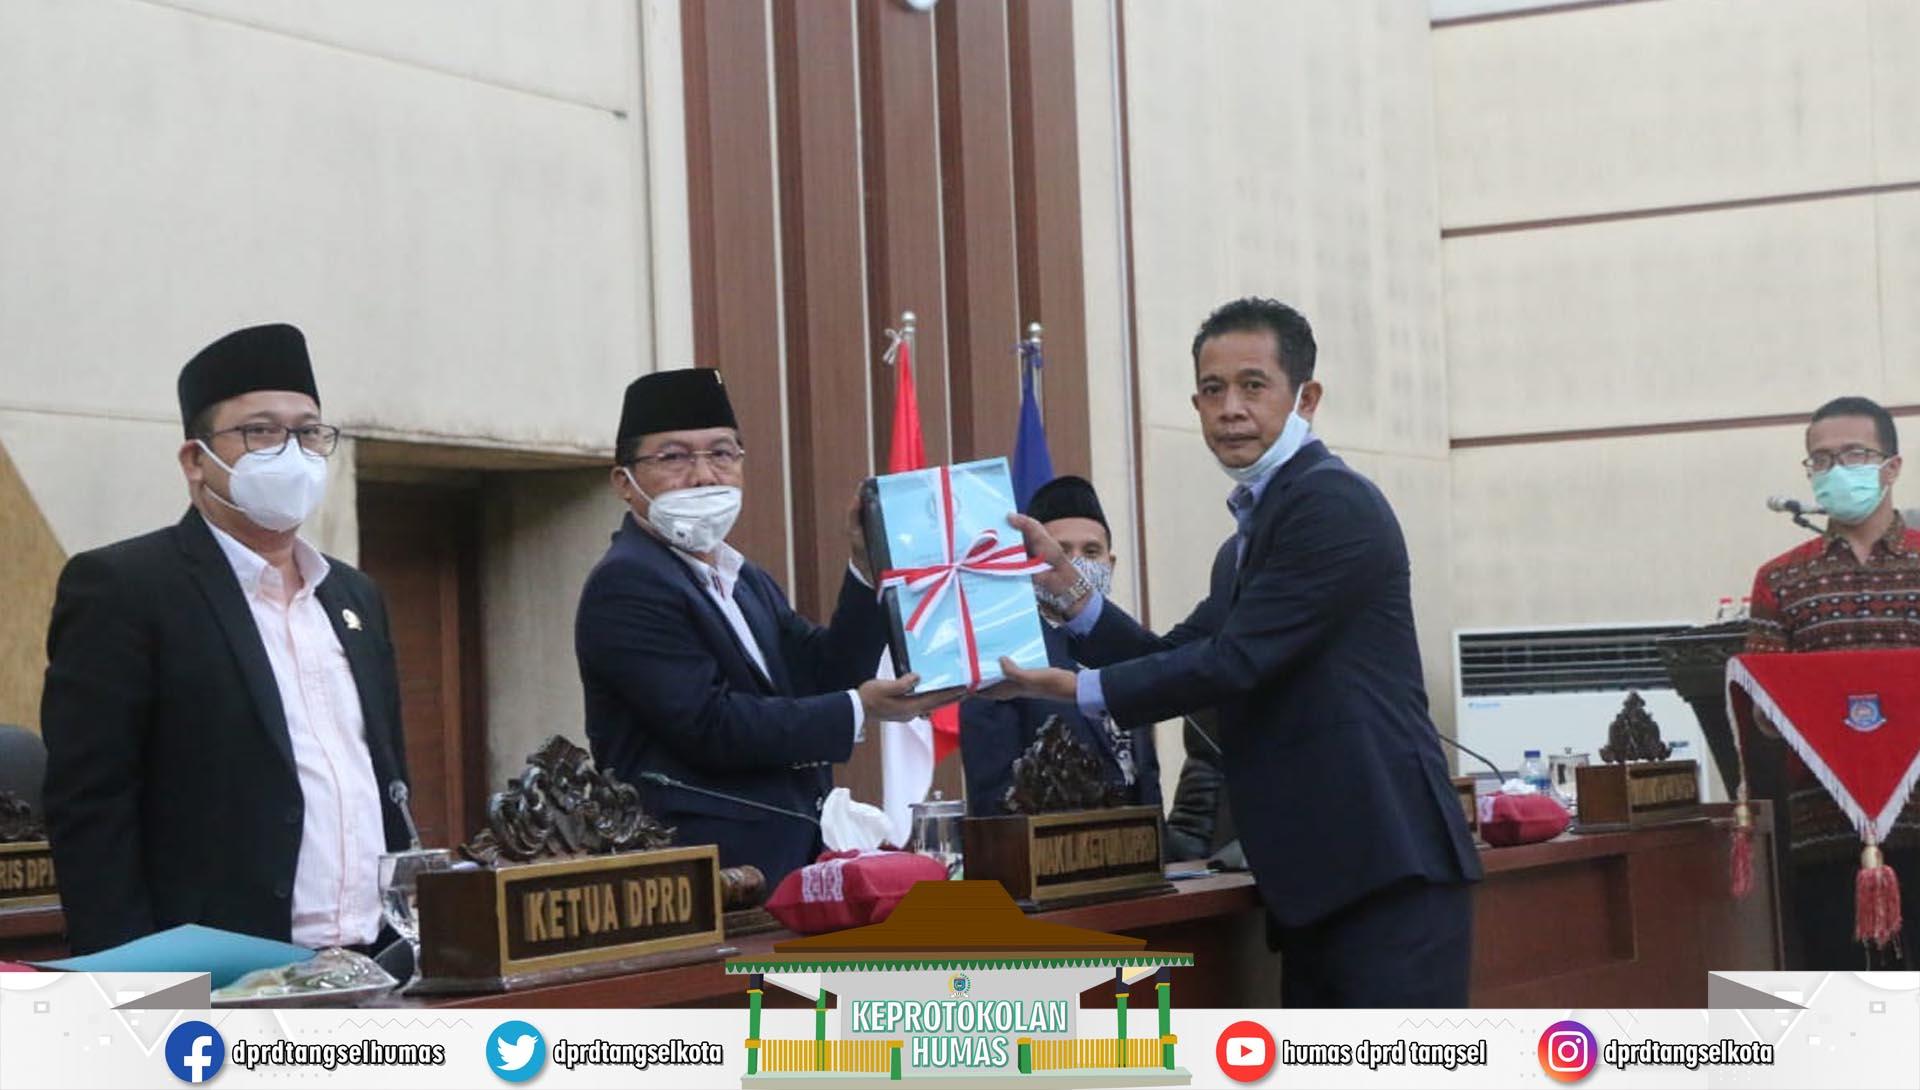 Paripurna persetujuan DPRD Pemindahtanganan Barang Milik Daerah